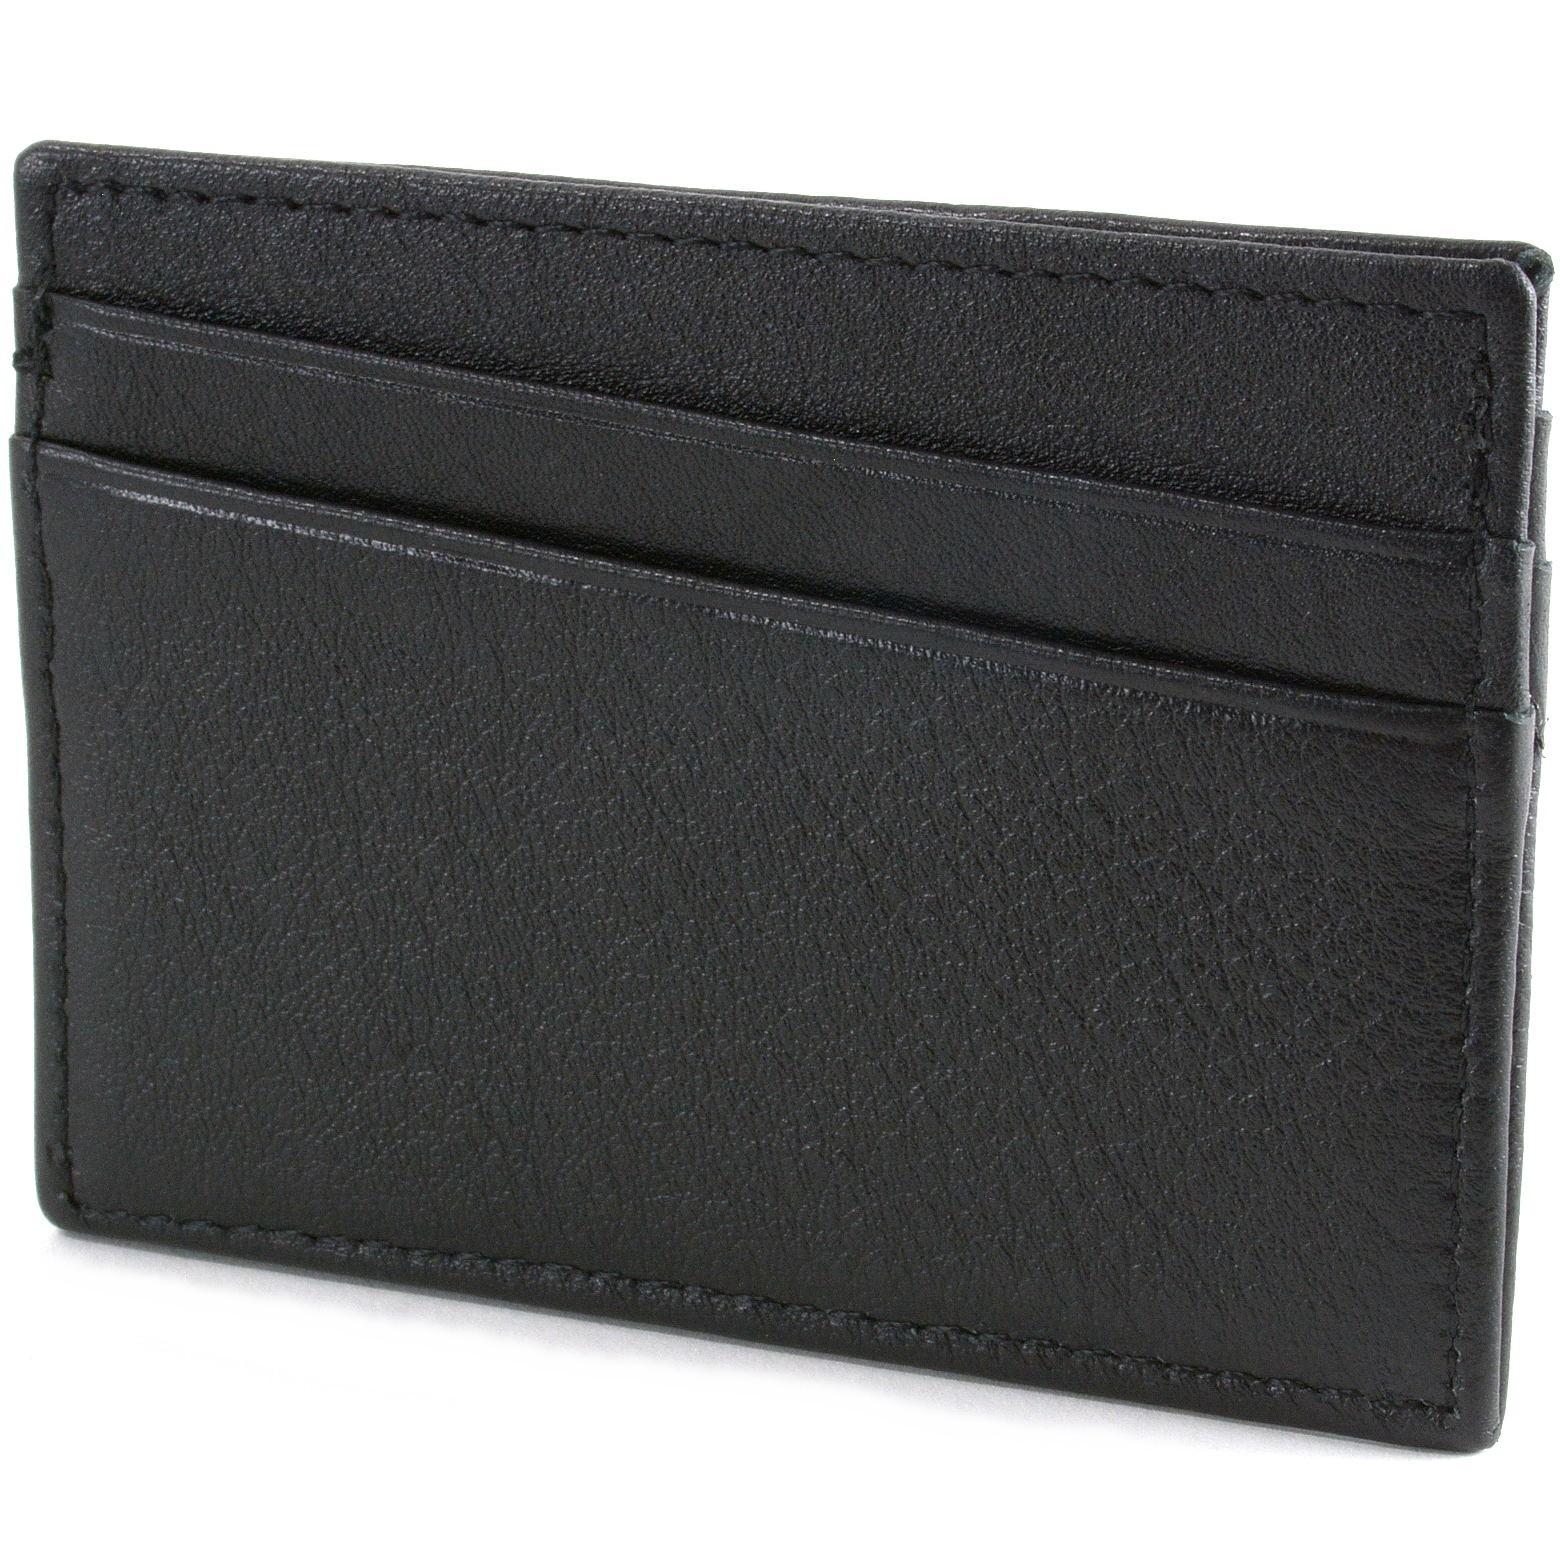 Alpine-Swiss-Minimalist-Leather-Front-Pocket-Wallet-5-Card-Slots-Slim-Thin-Case thumbnail 19